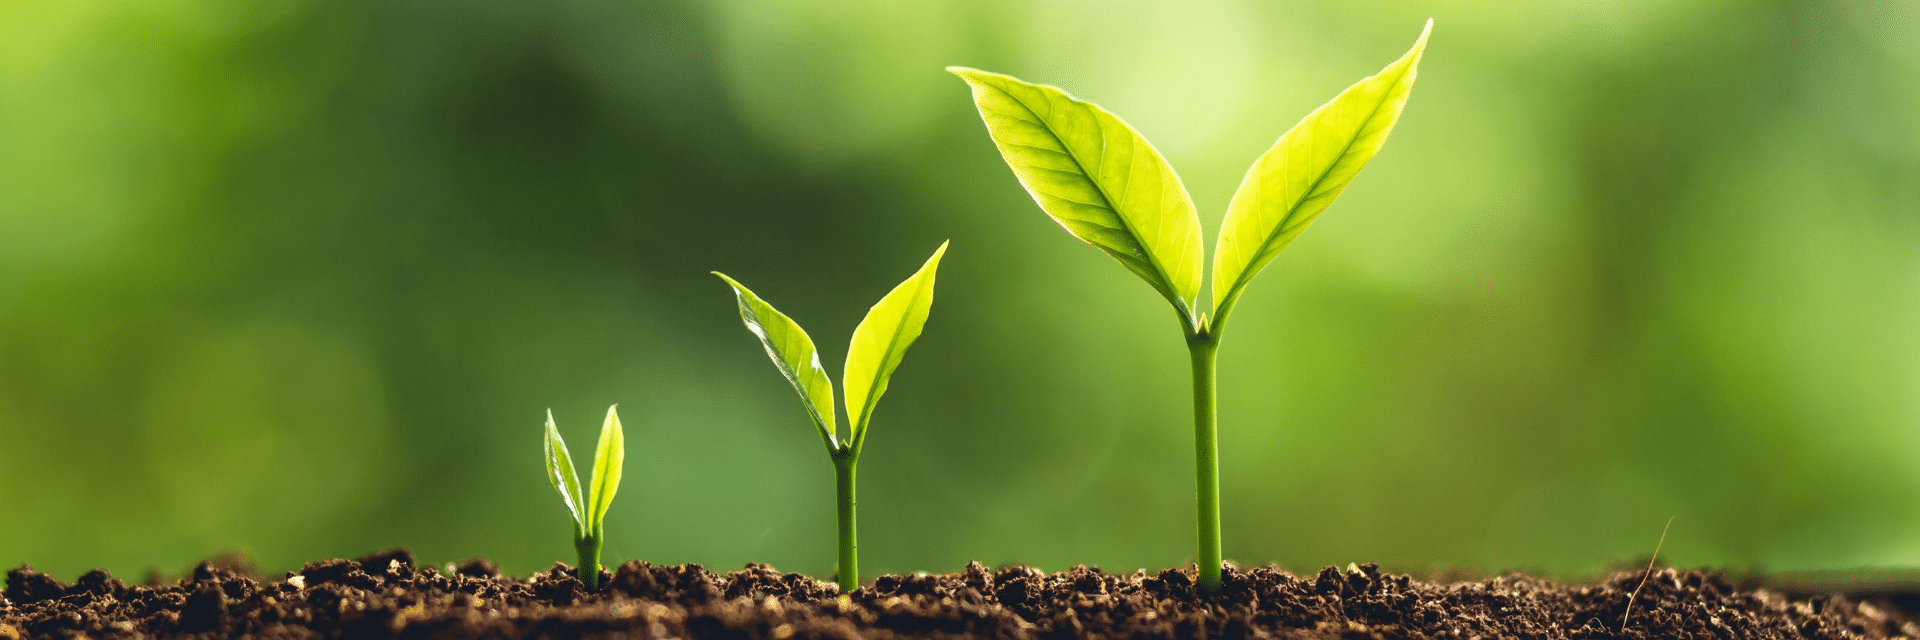 3 budding plants emerging from soil